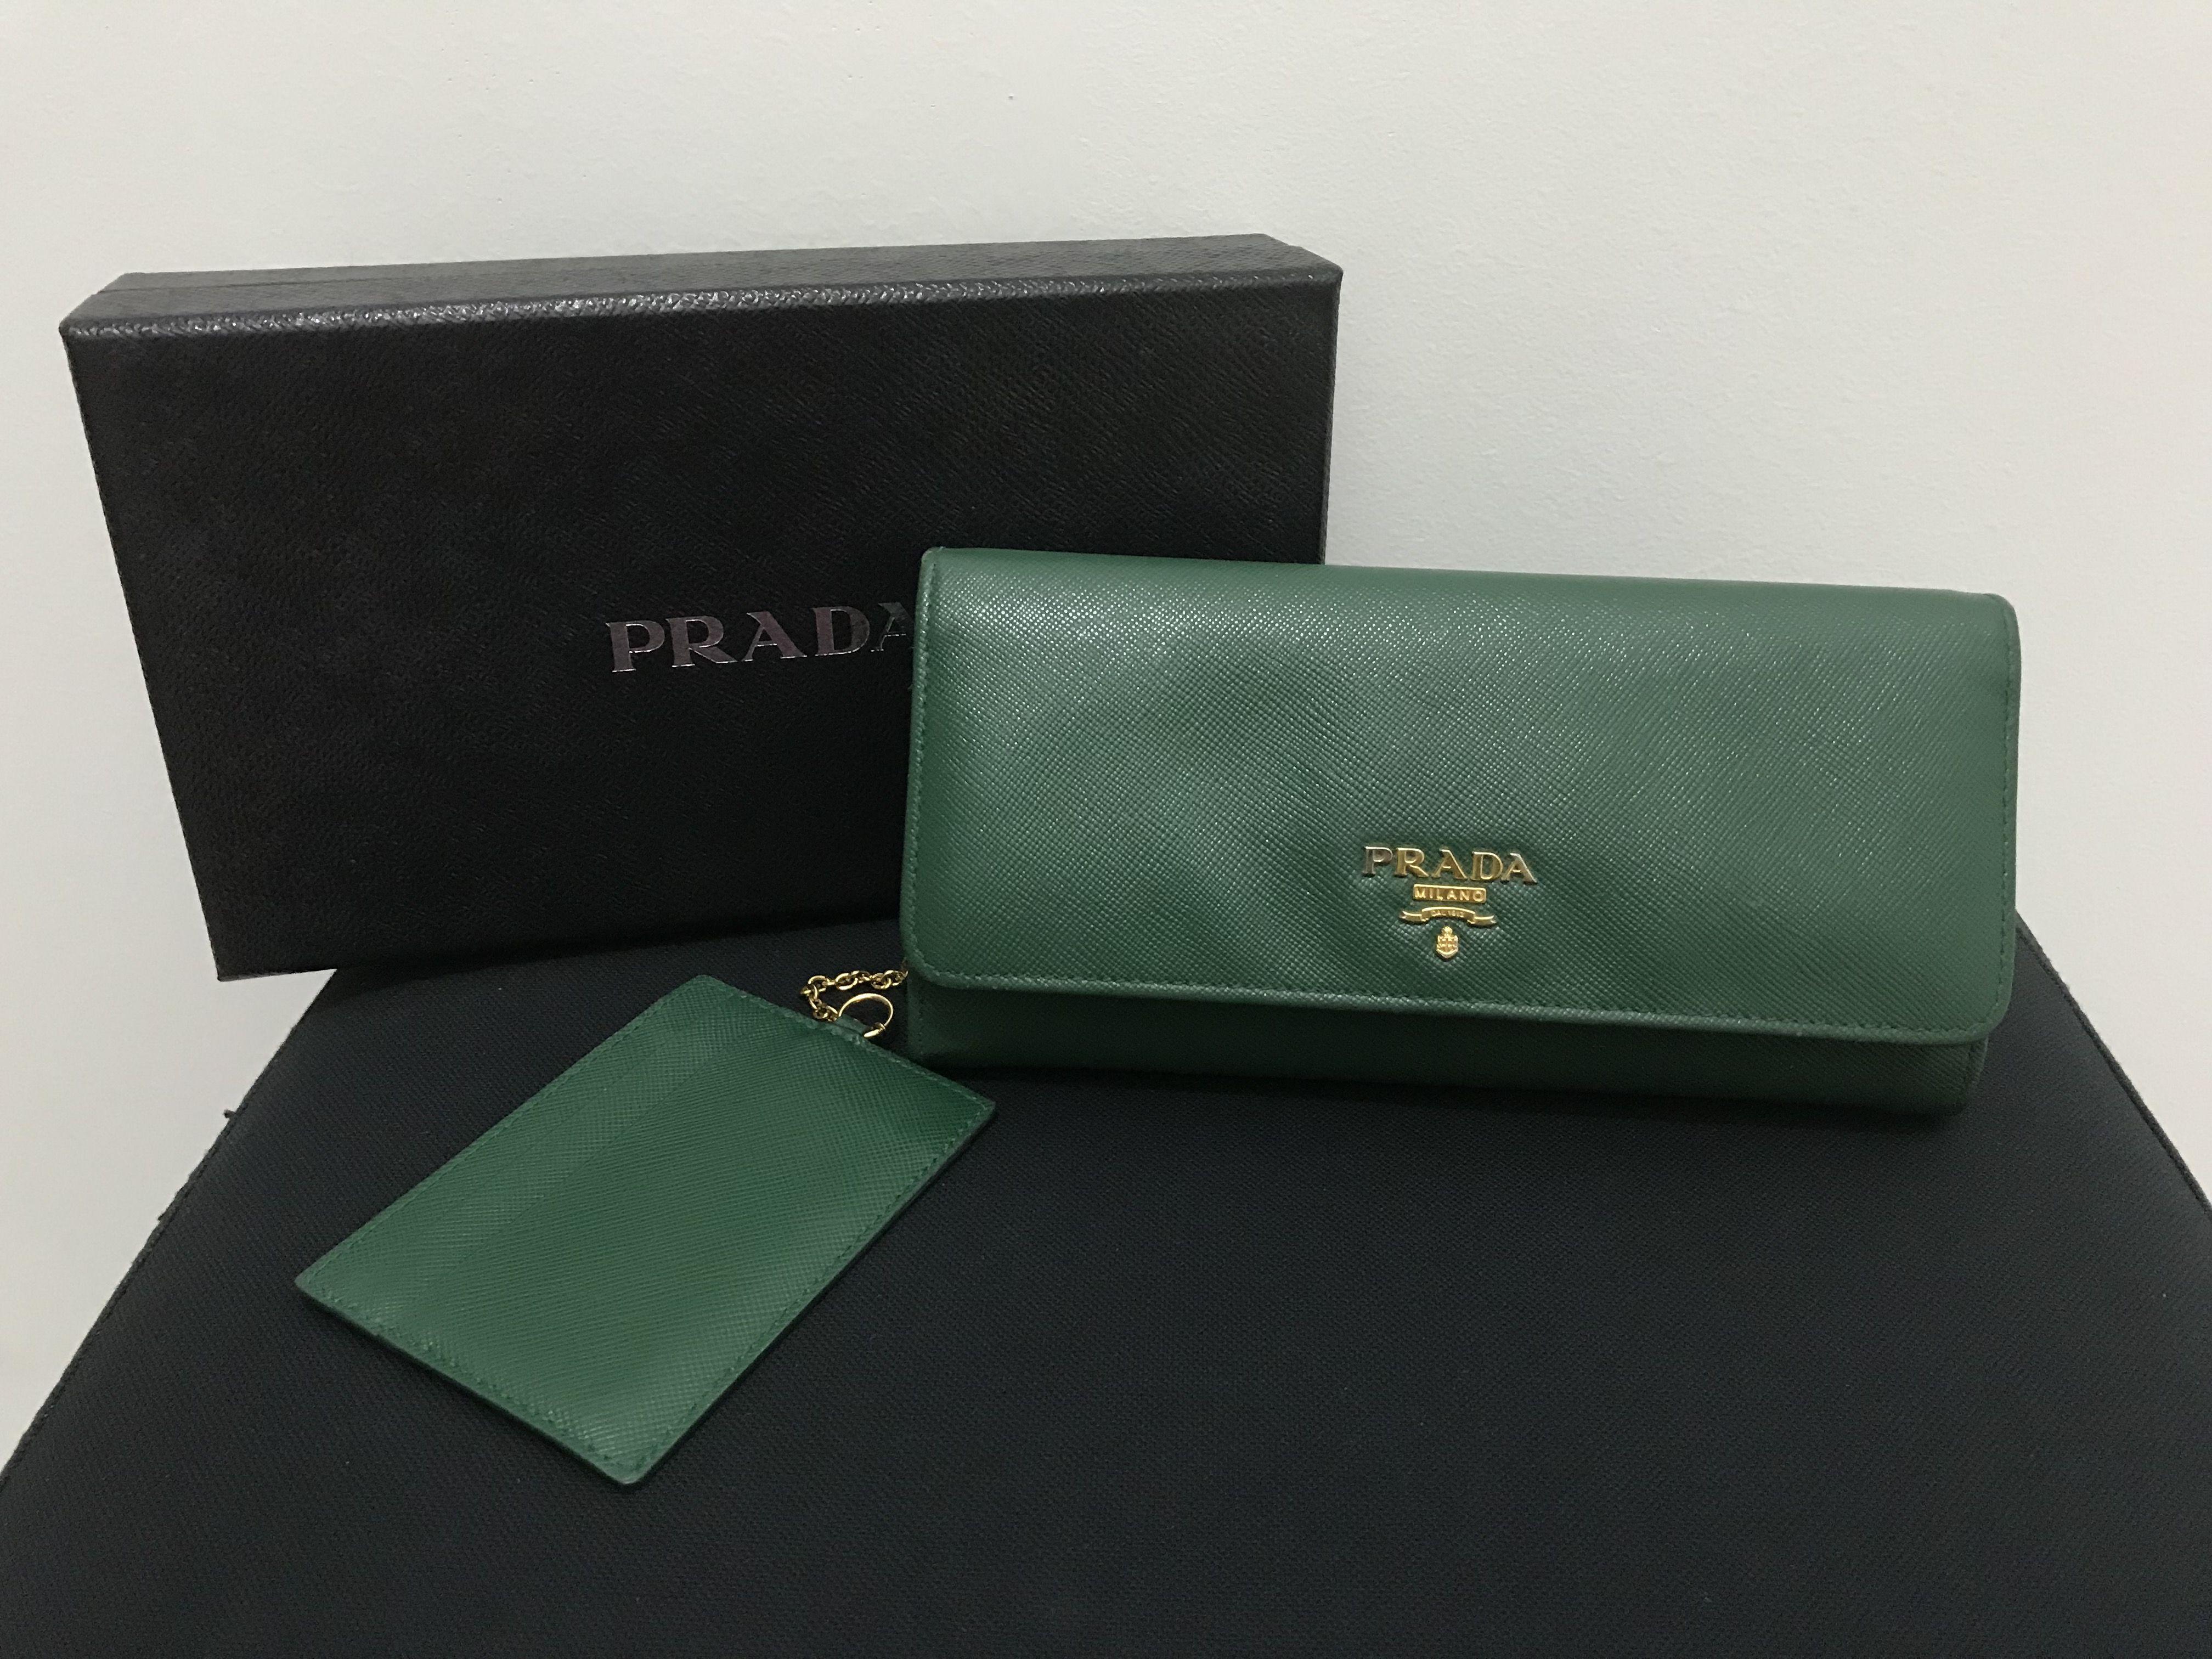 01eb47b32463 PRADA Saffiano Metal Classic Wallet #green #prada #wallet #soldout ...